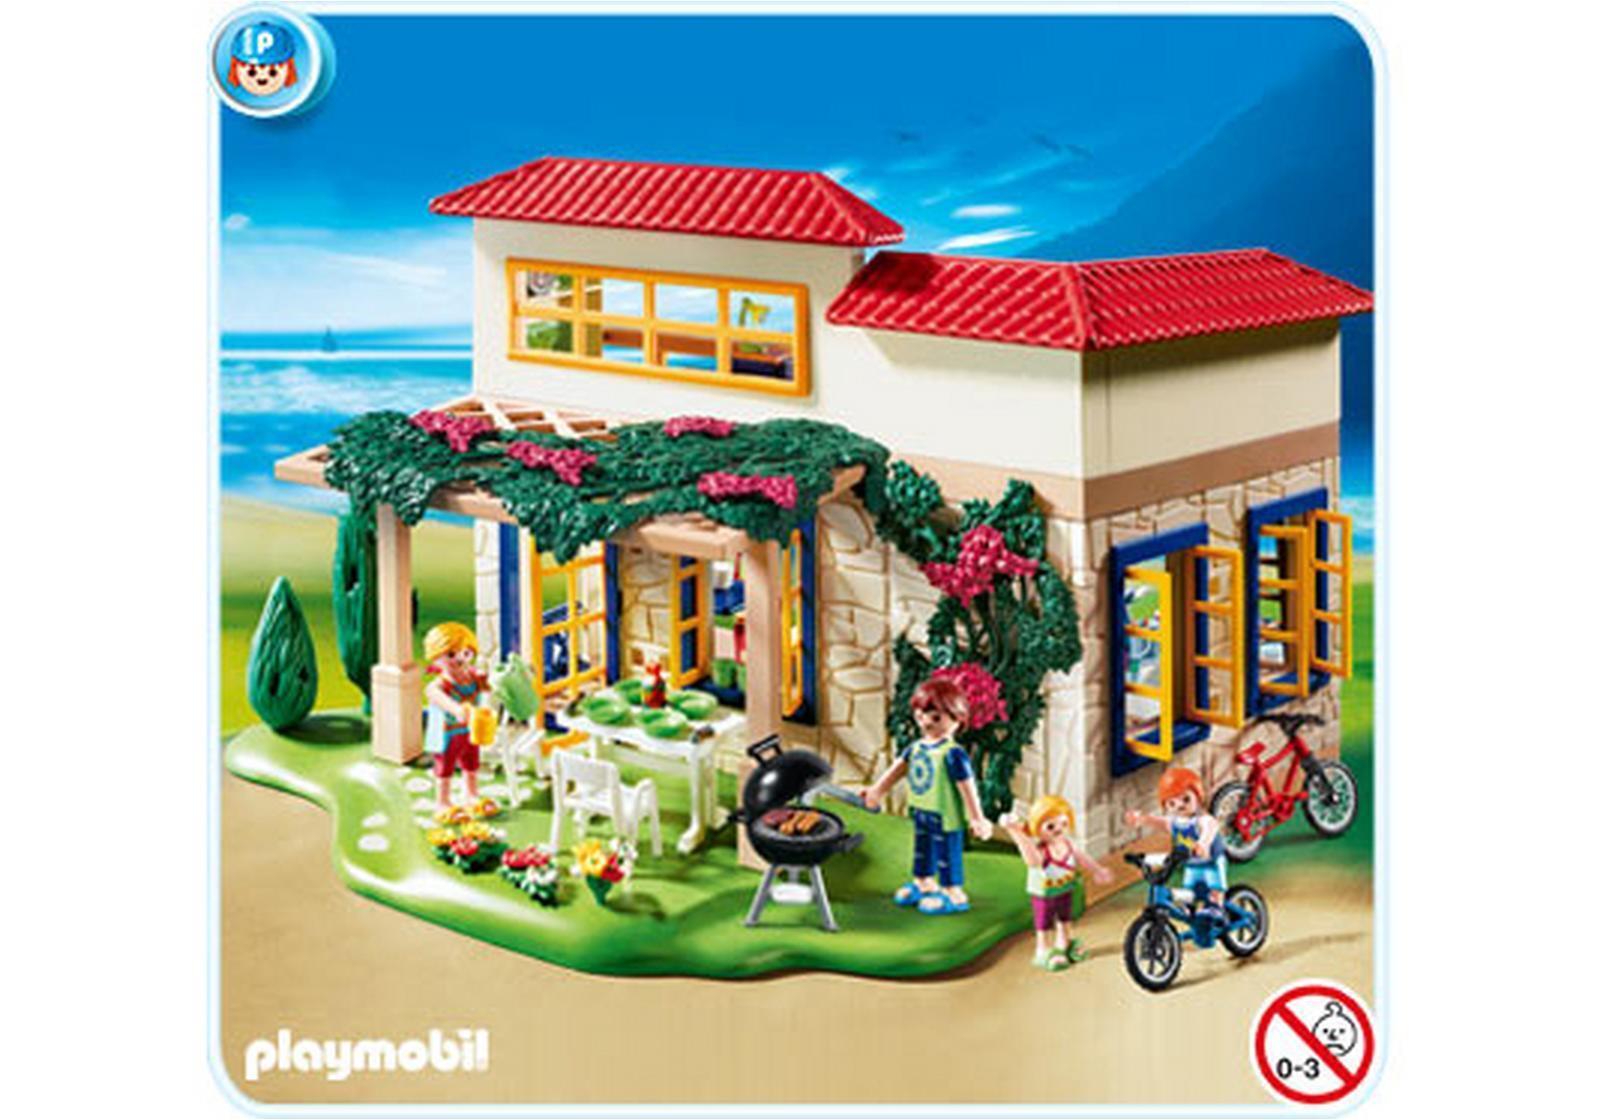 Playmobil 4857 Ferientraumhaus Toscana Ferienhaus City  OVP